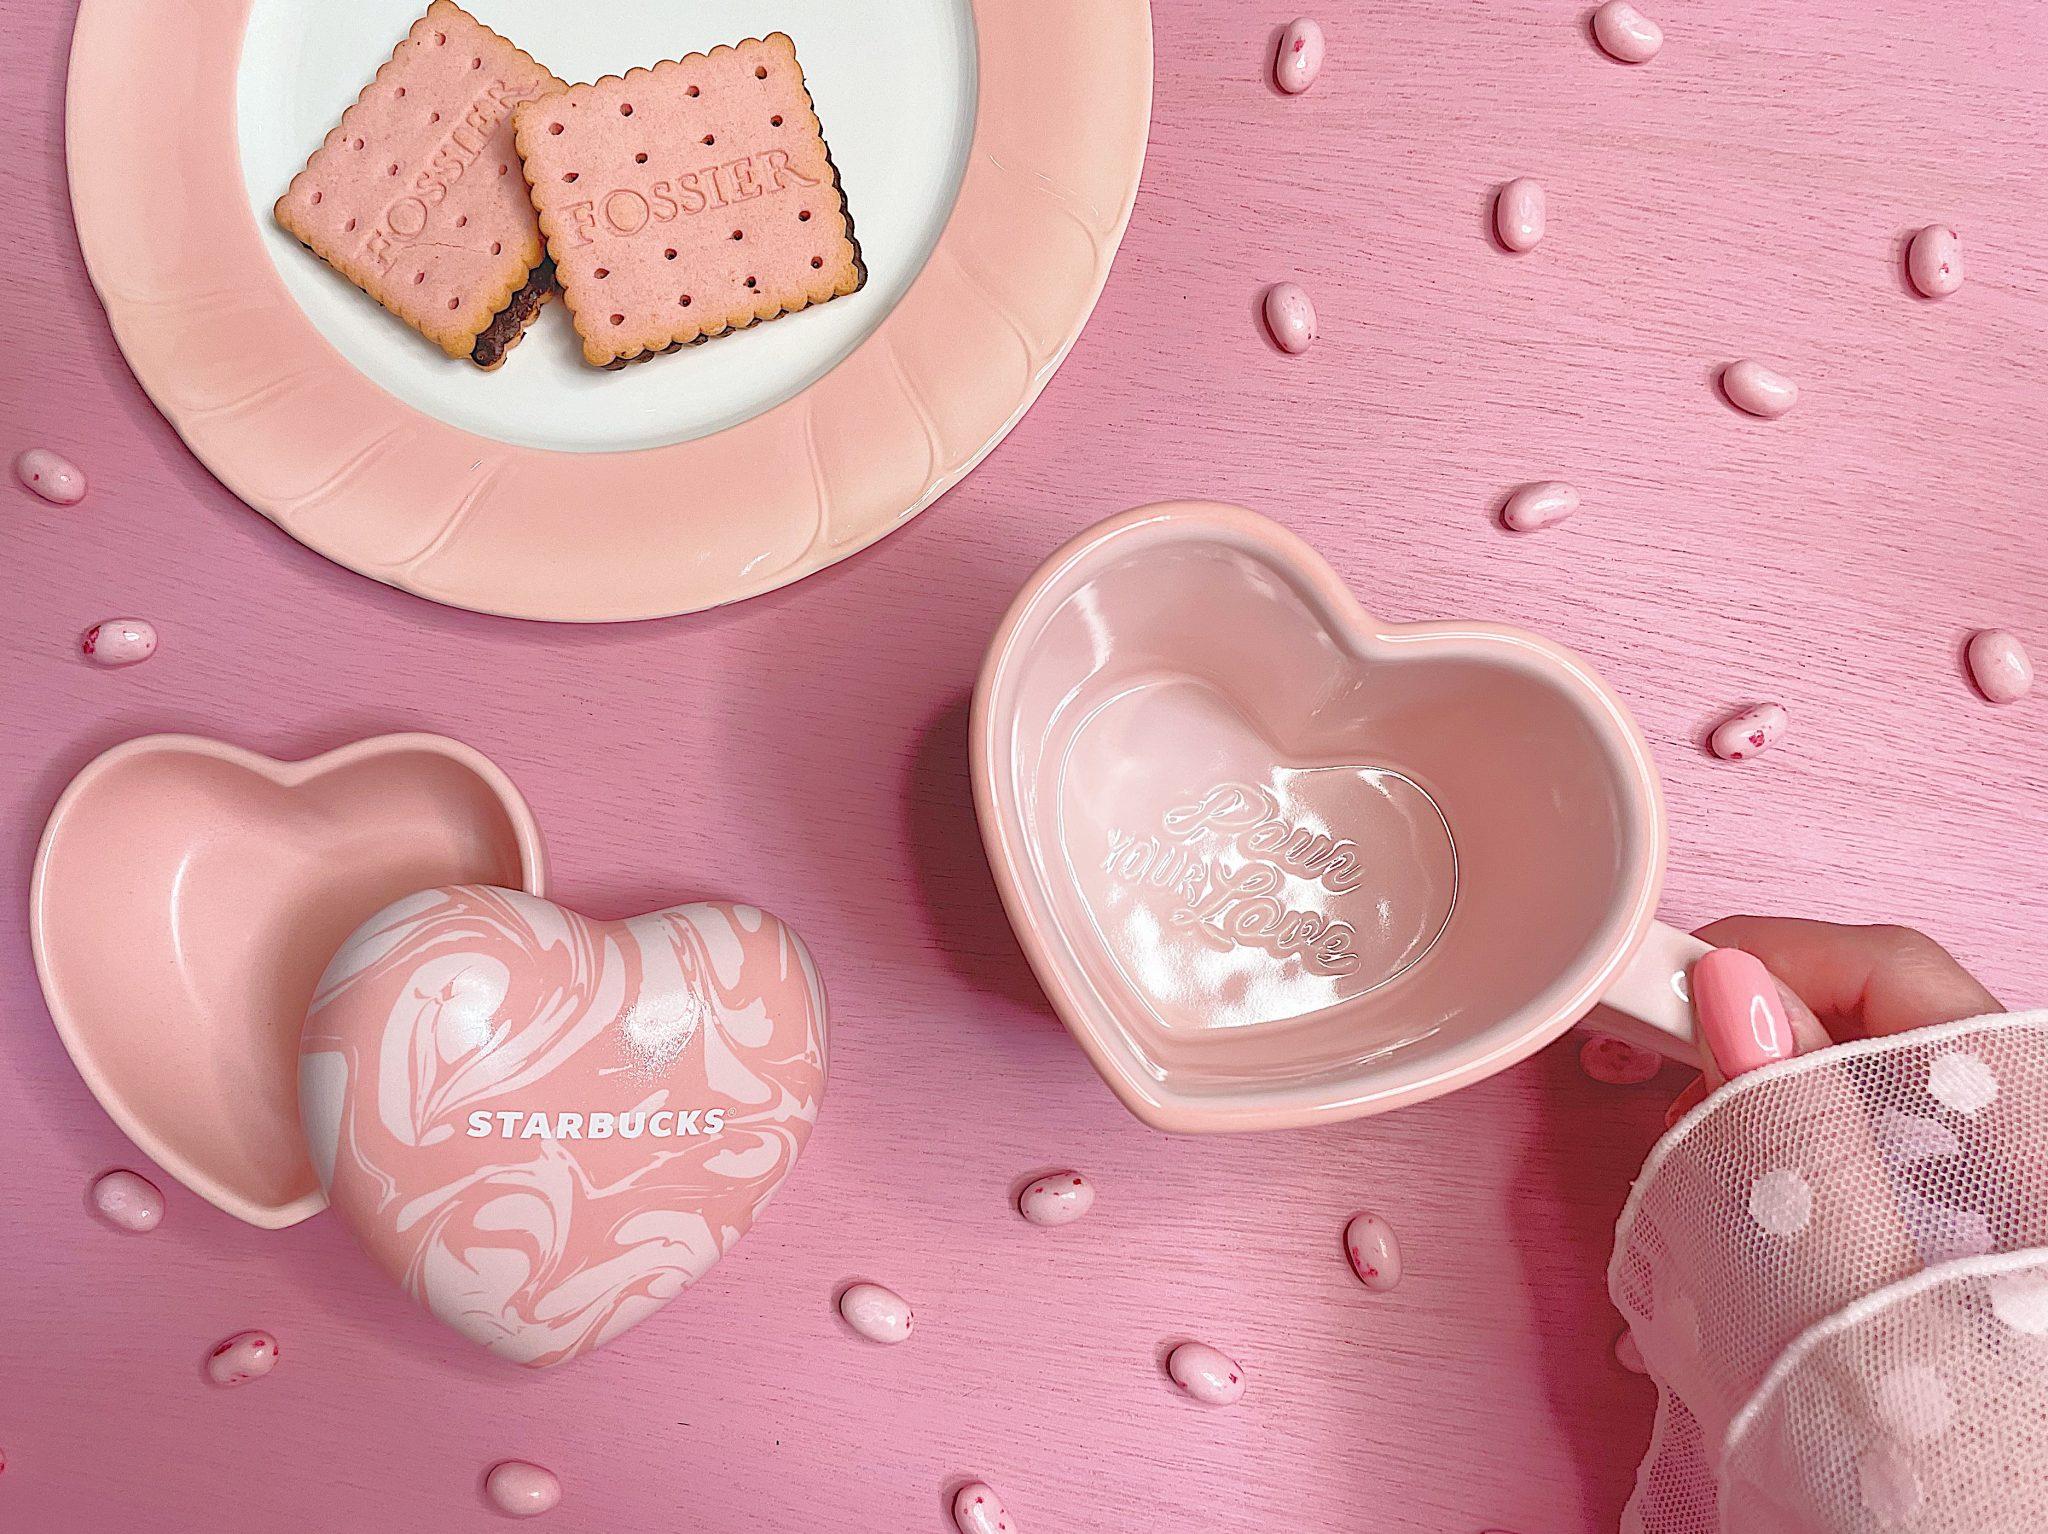 #starbucks のバレンタイングッズがかわいすぎる♡